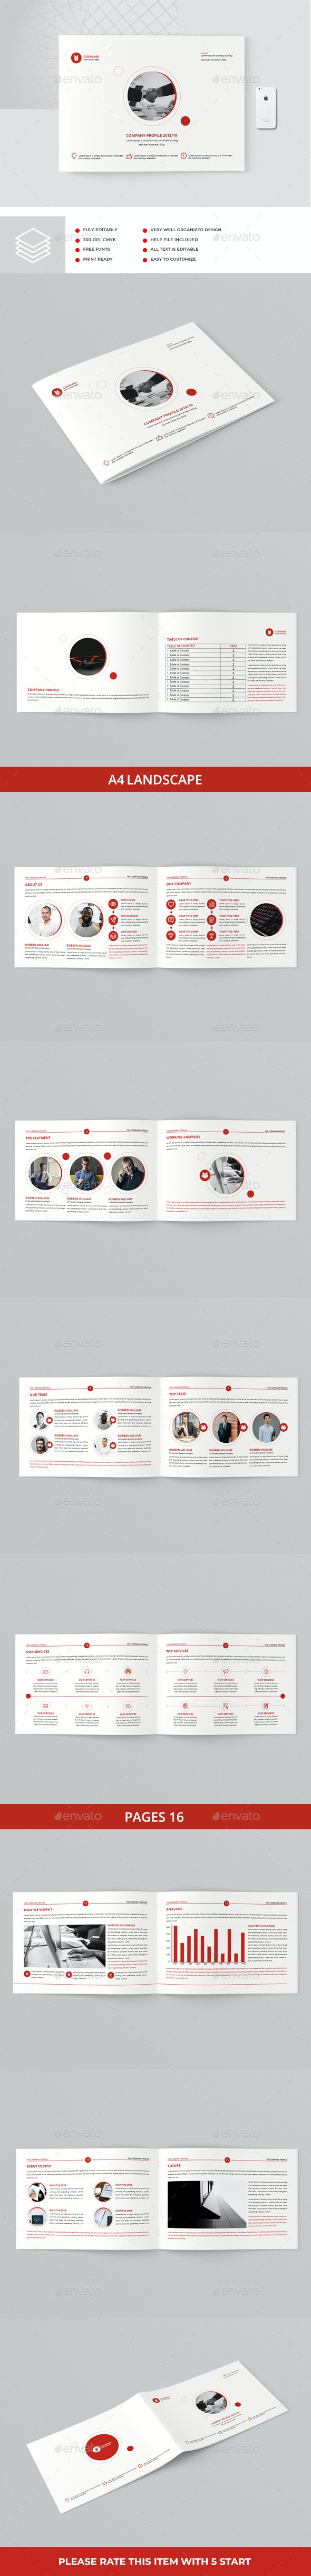 Company Profile Landscape A4 - Corporate Brochures